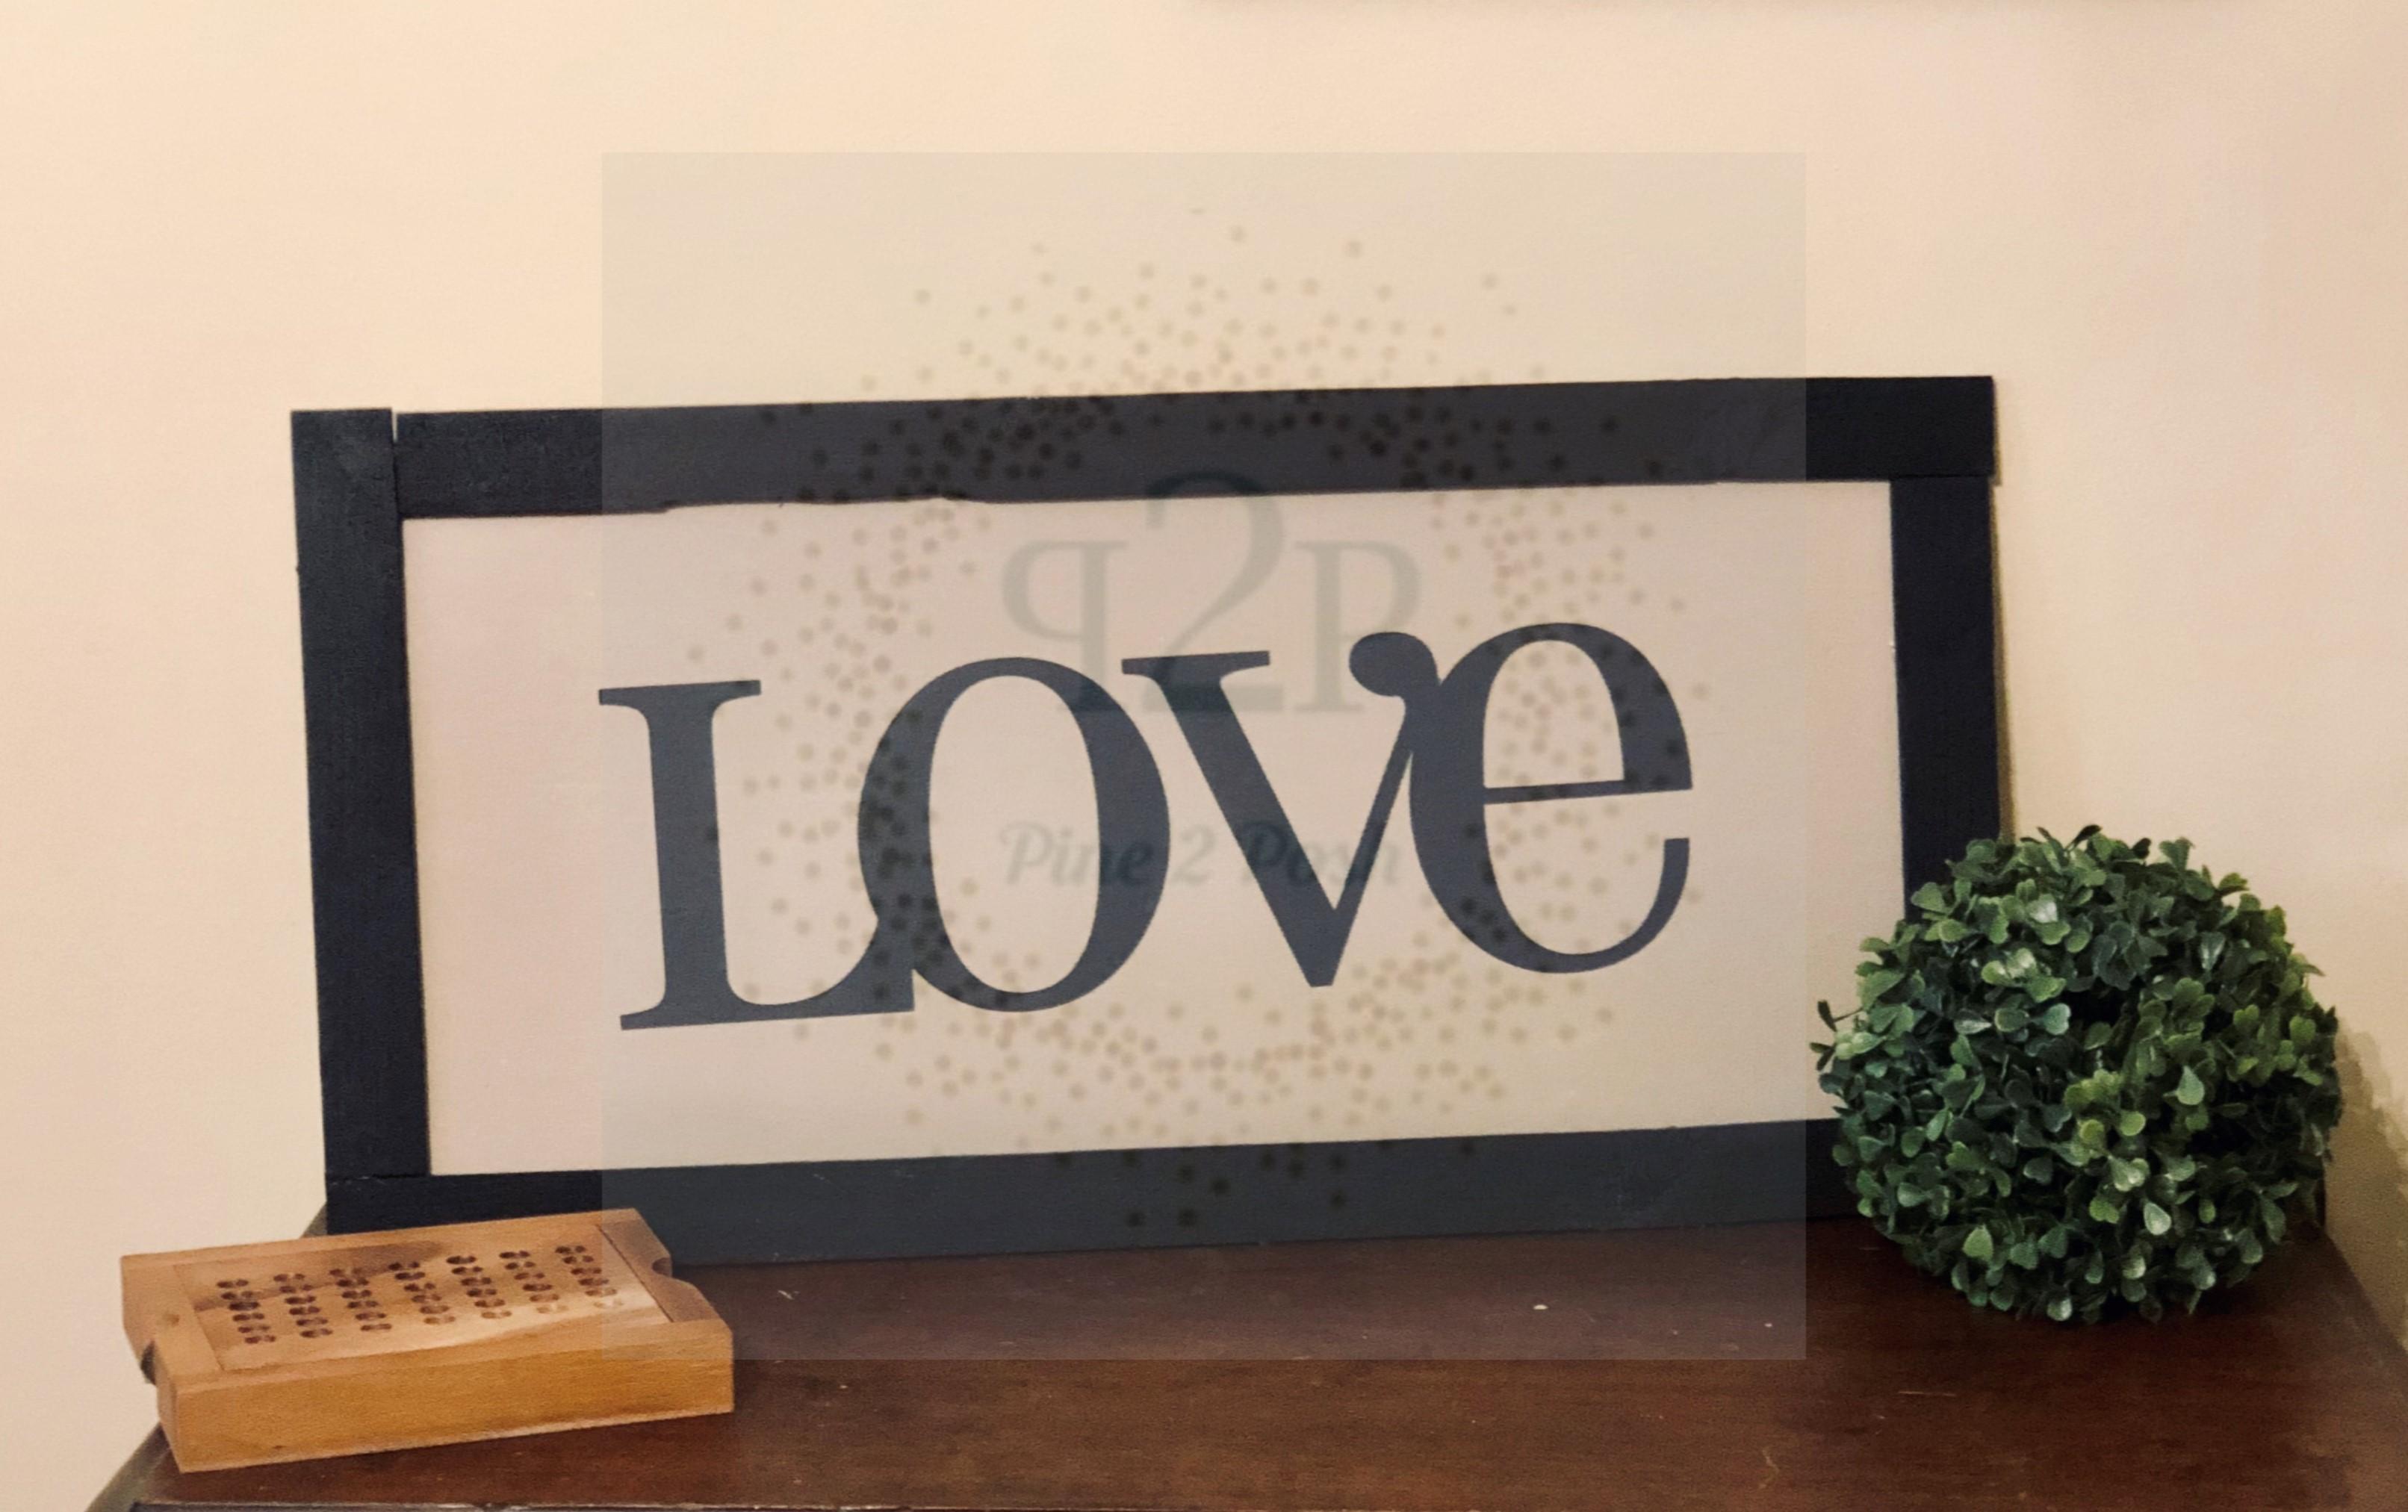 234 - LOVE